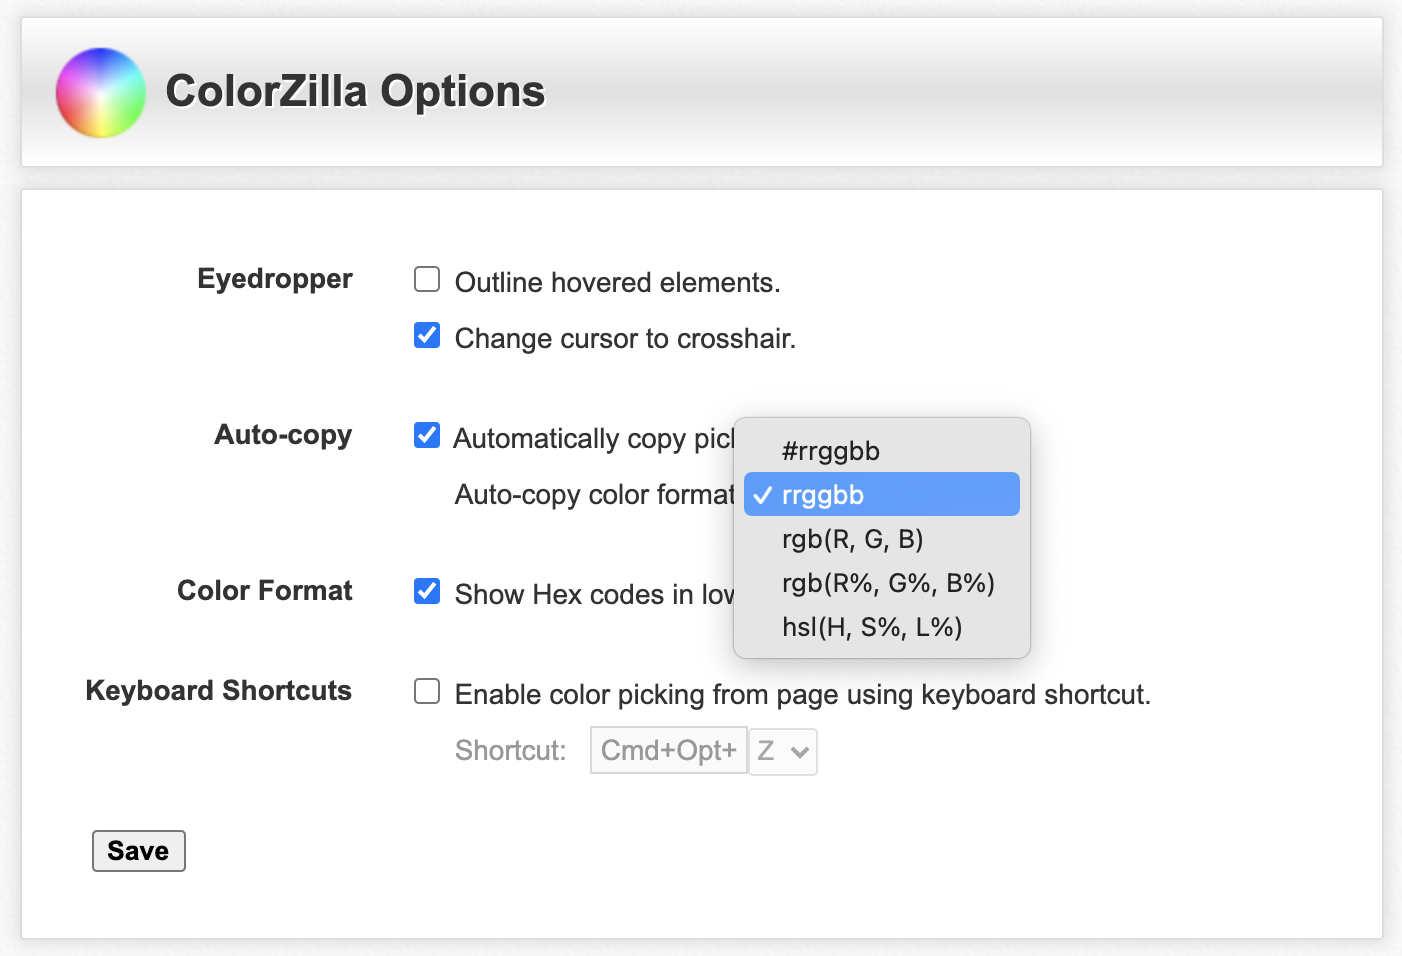 ColorZilla Options